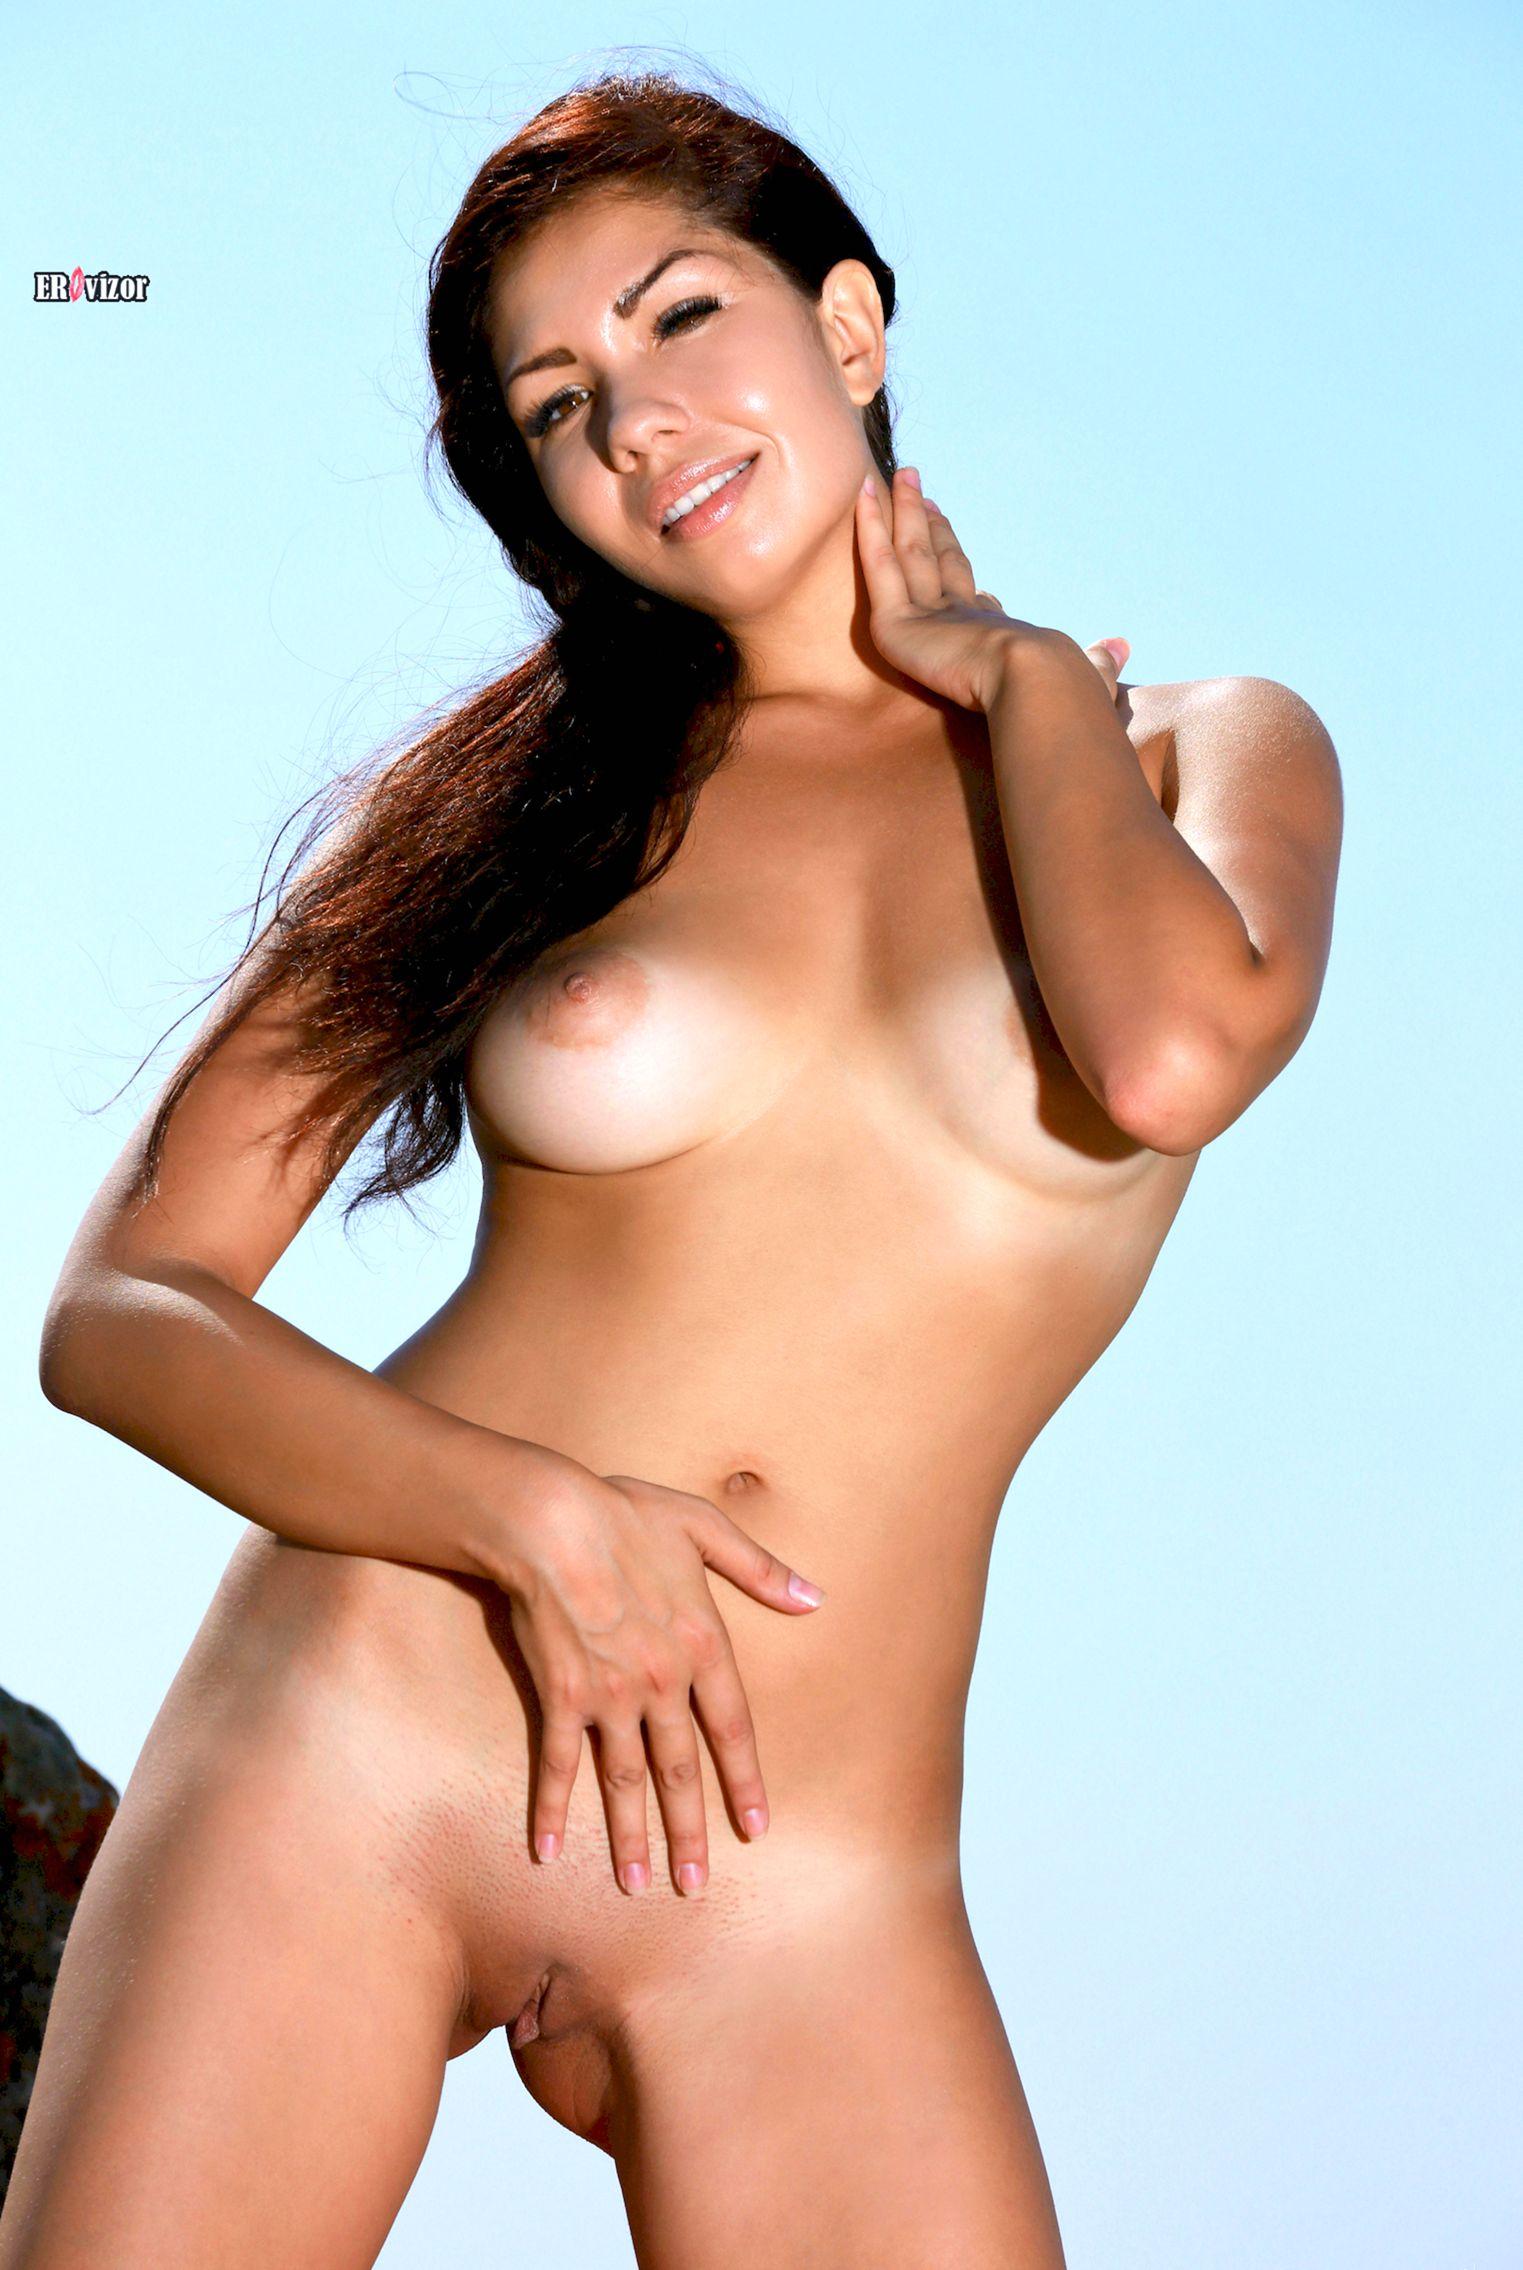 Romana-A-naked_sun_day (1)